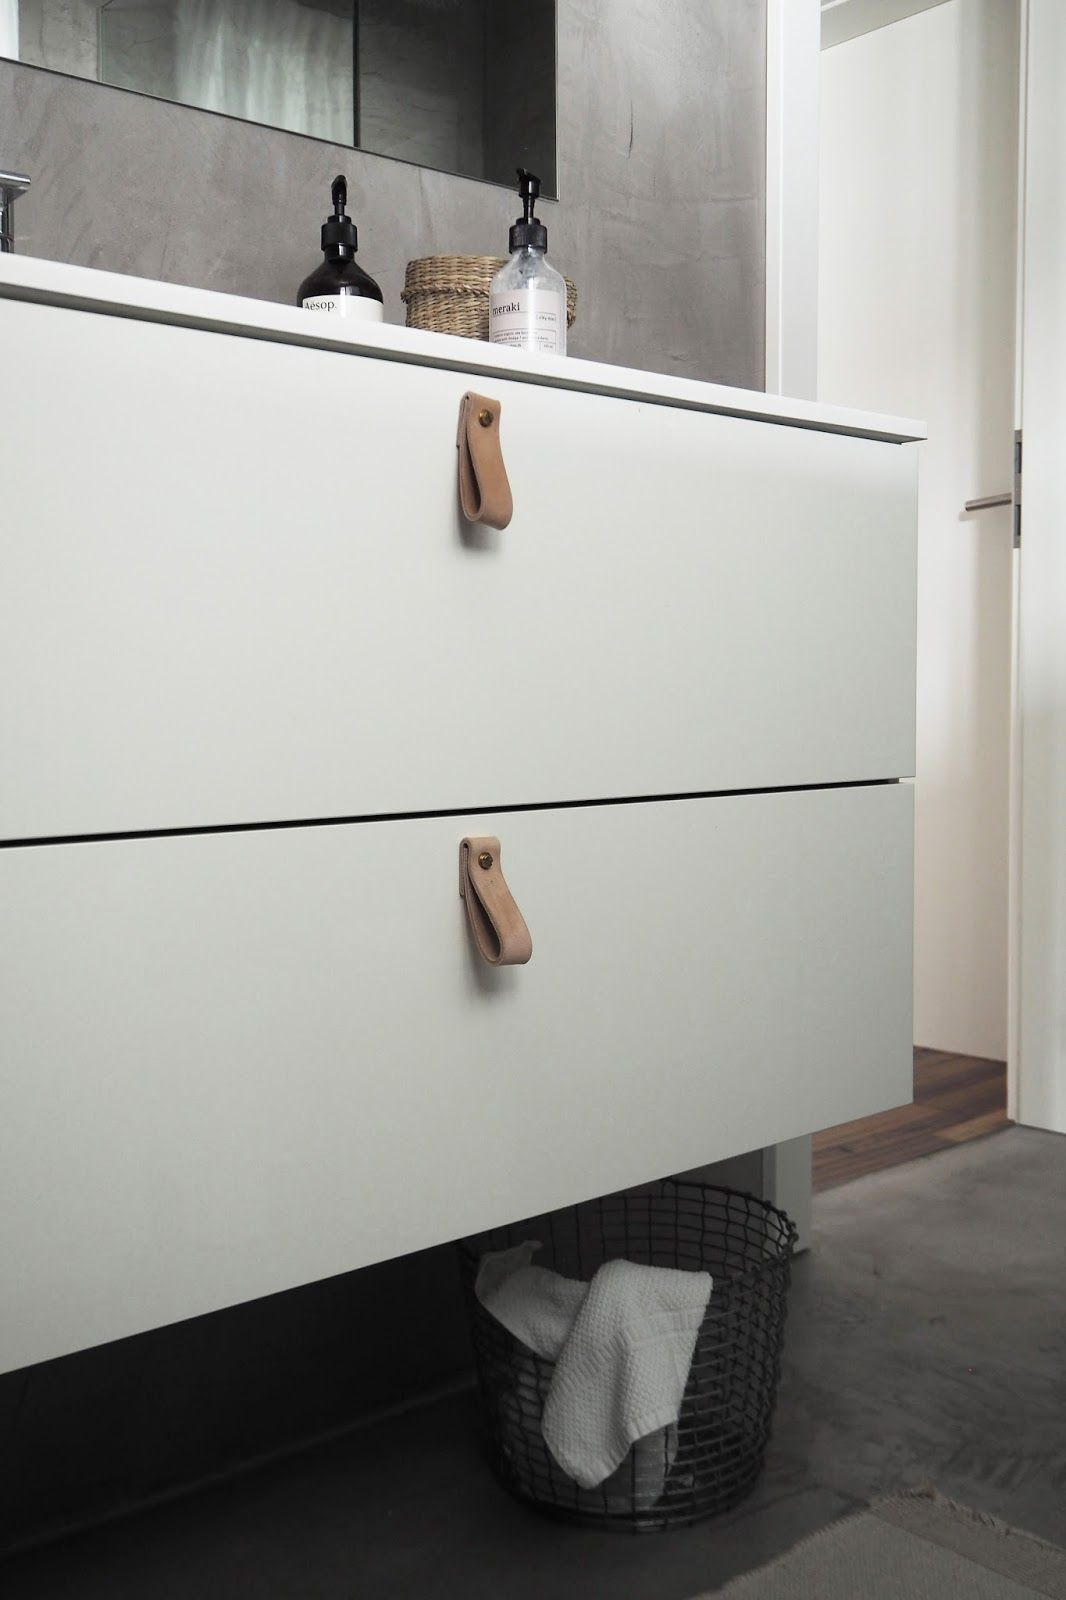 Ikea Hacken Badezimmer Badezimmer Unterschrank Ikea